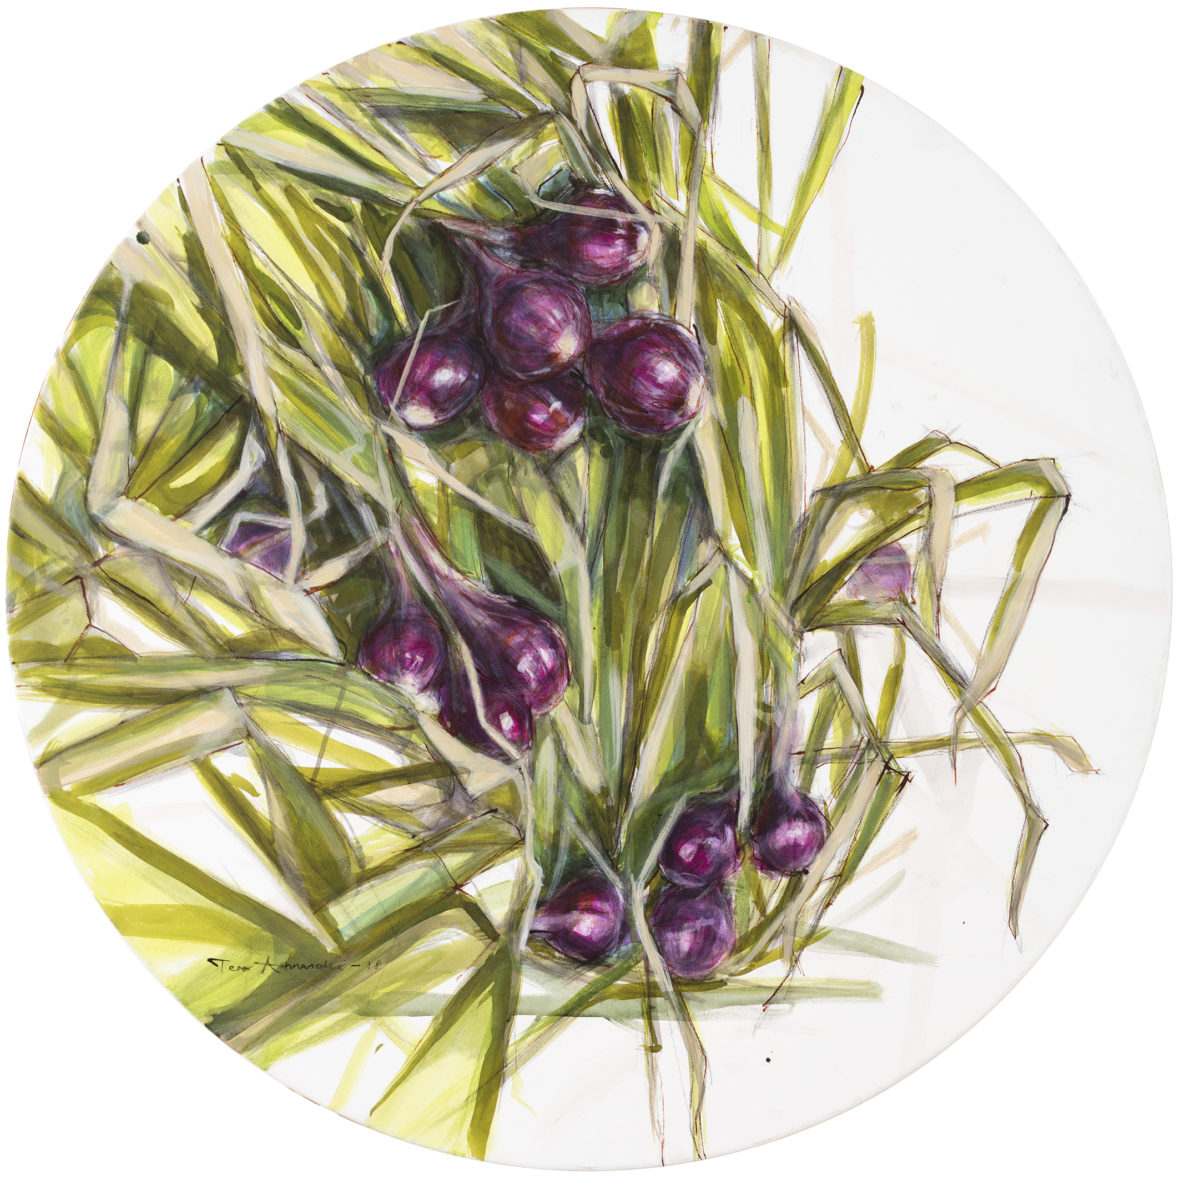 Punasipulit / Red onion